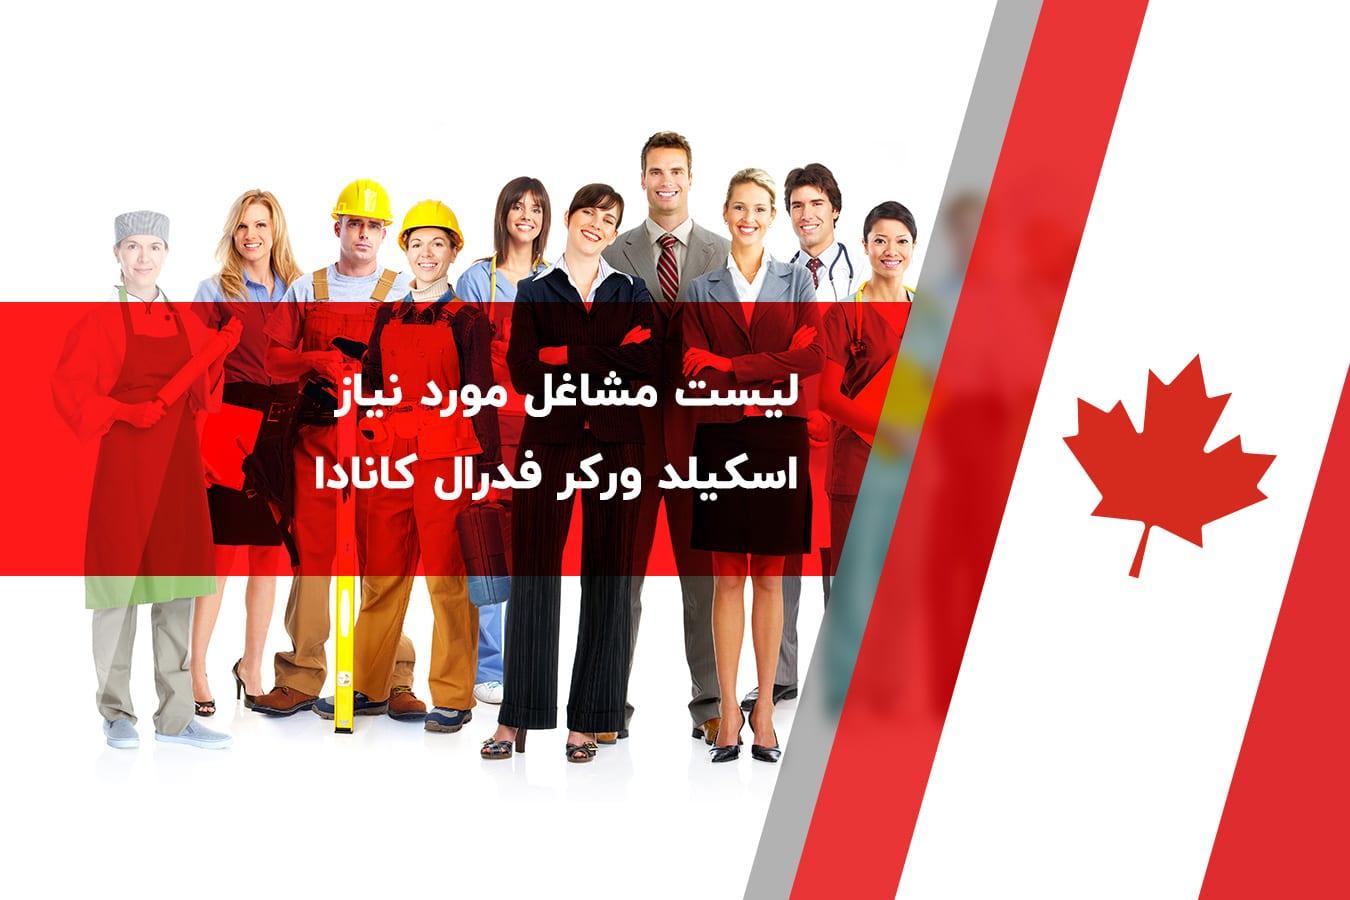 لیست مشاغل واجد شرایط اسکیلد ورکر فدرال کانادا